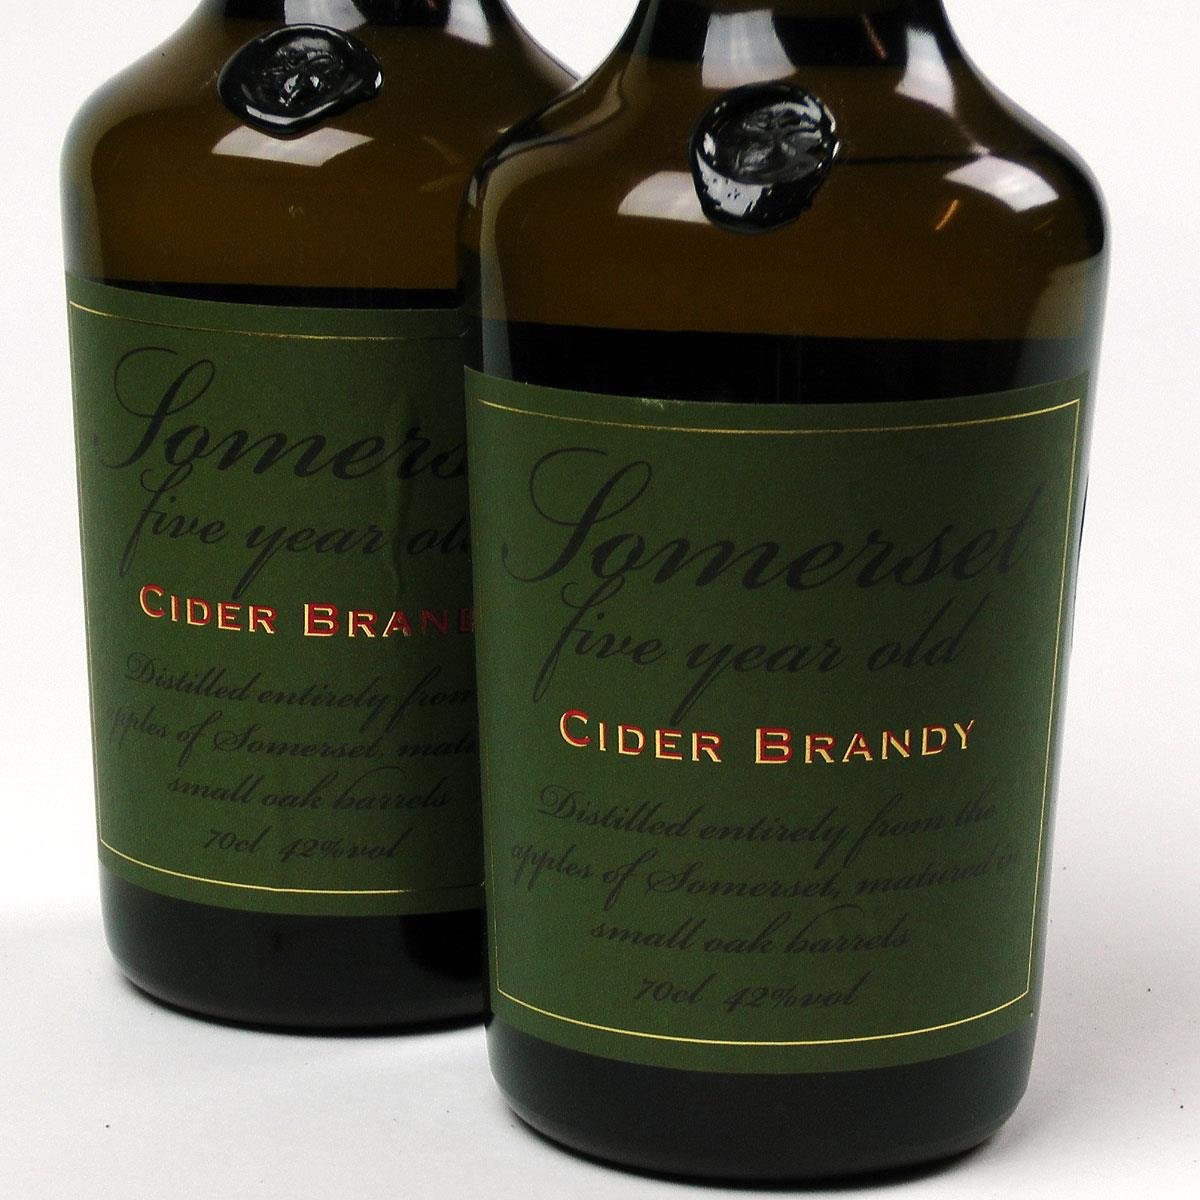 Somerset Cider Brandy: 5 year old